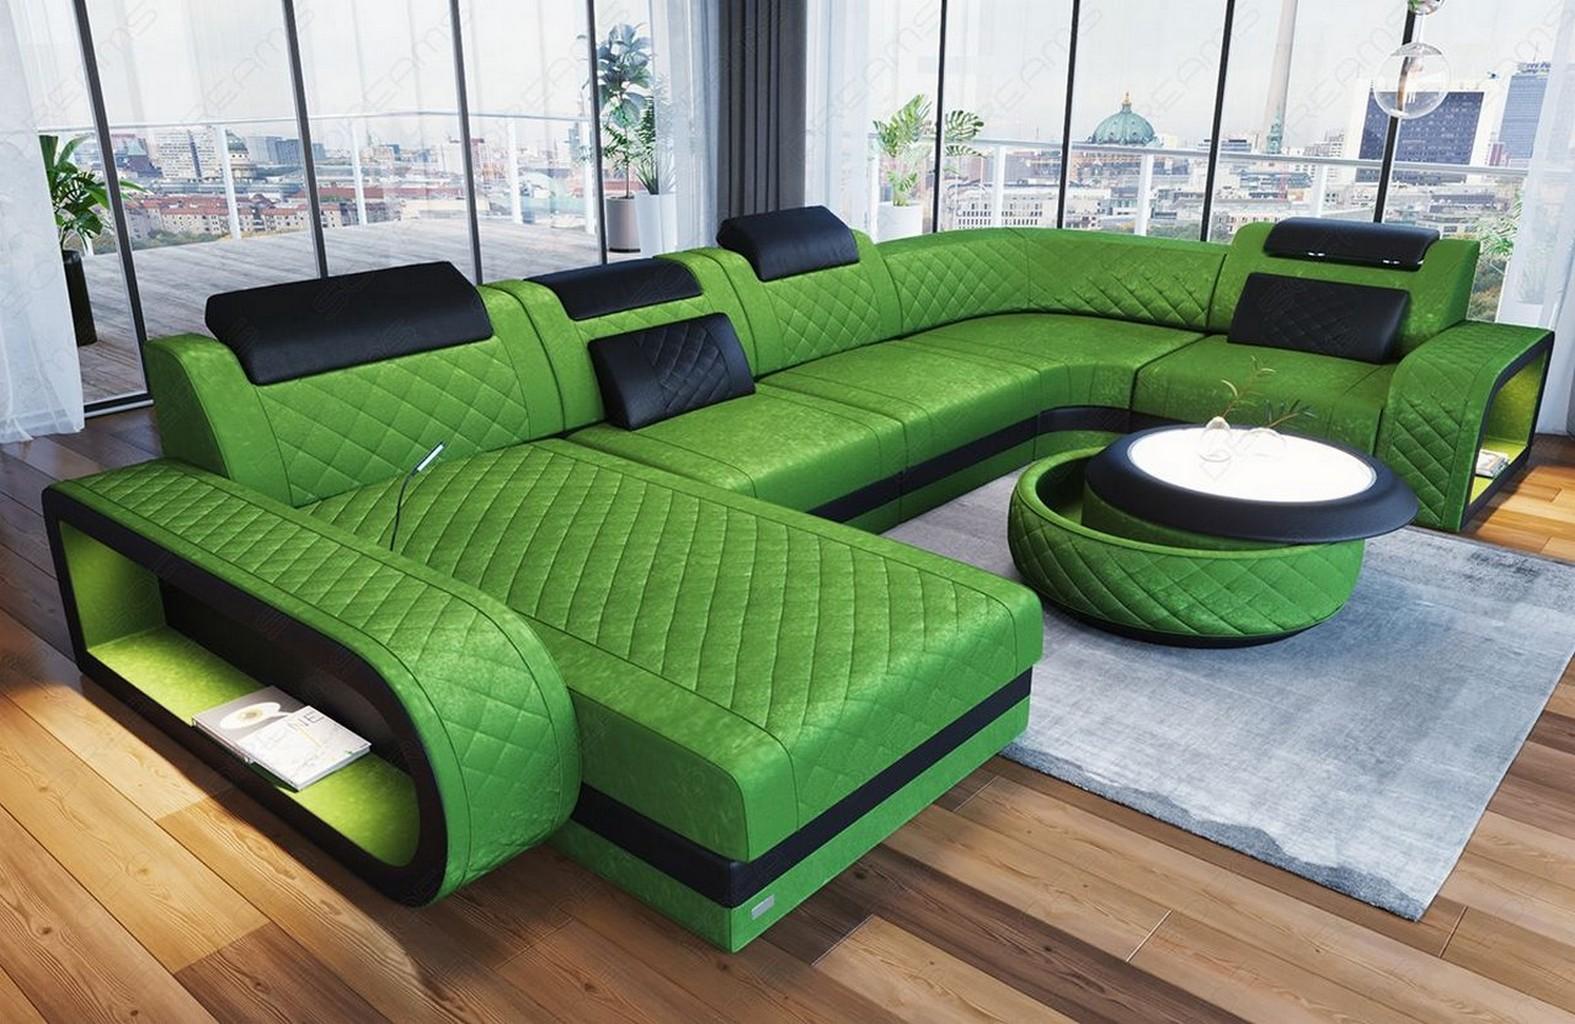 sofa wohnlandschaft couch samtstoff ottomane chesterfield berlin u in gr n led ebay